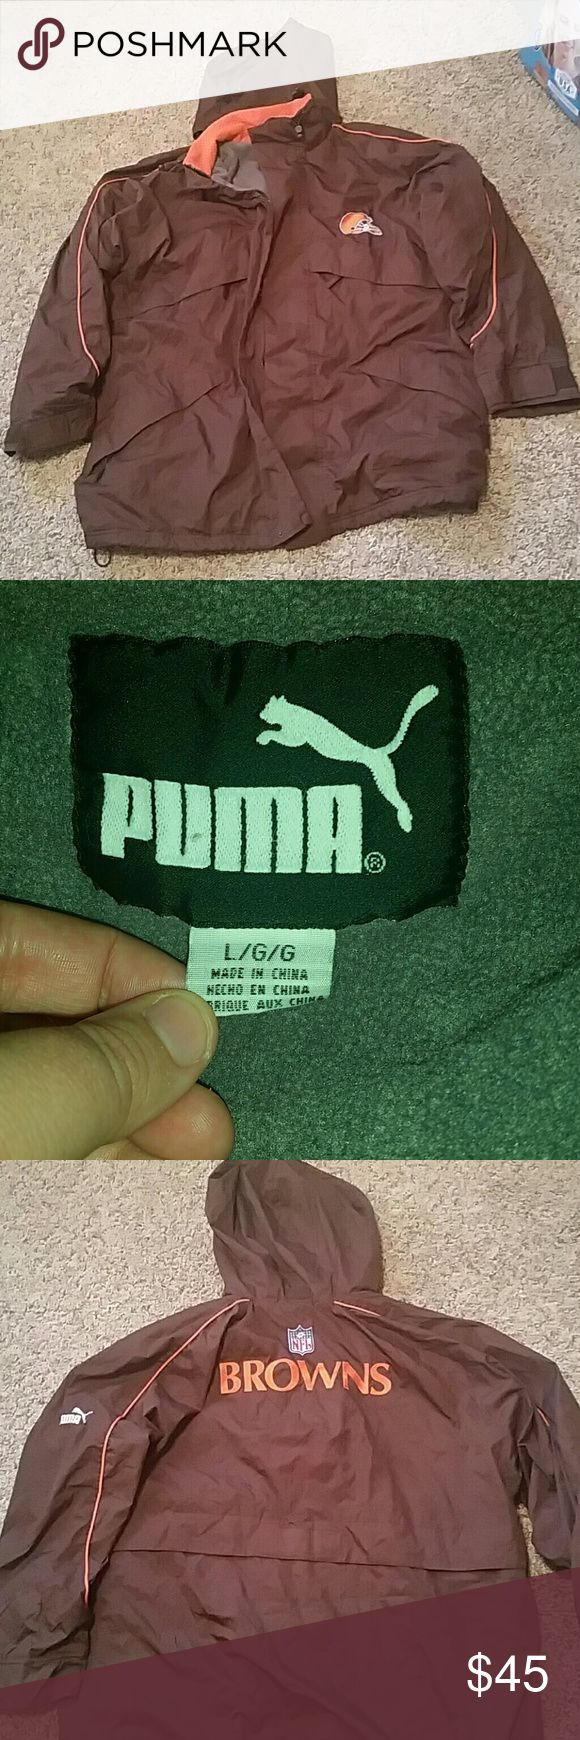 Puma size L NFL BROWNS jacket Puma size L NFL BROWNS jacket. Lined with fleece  ***24 hour sale! Puma Jackets & Coats